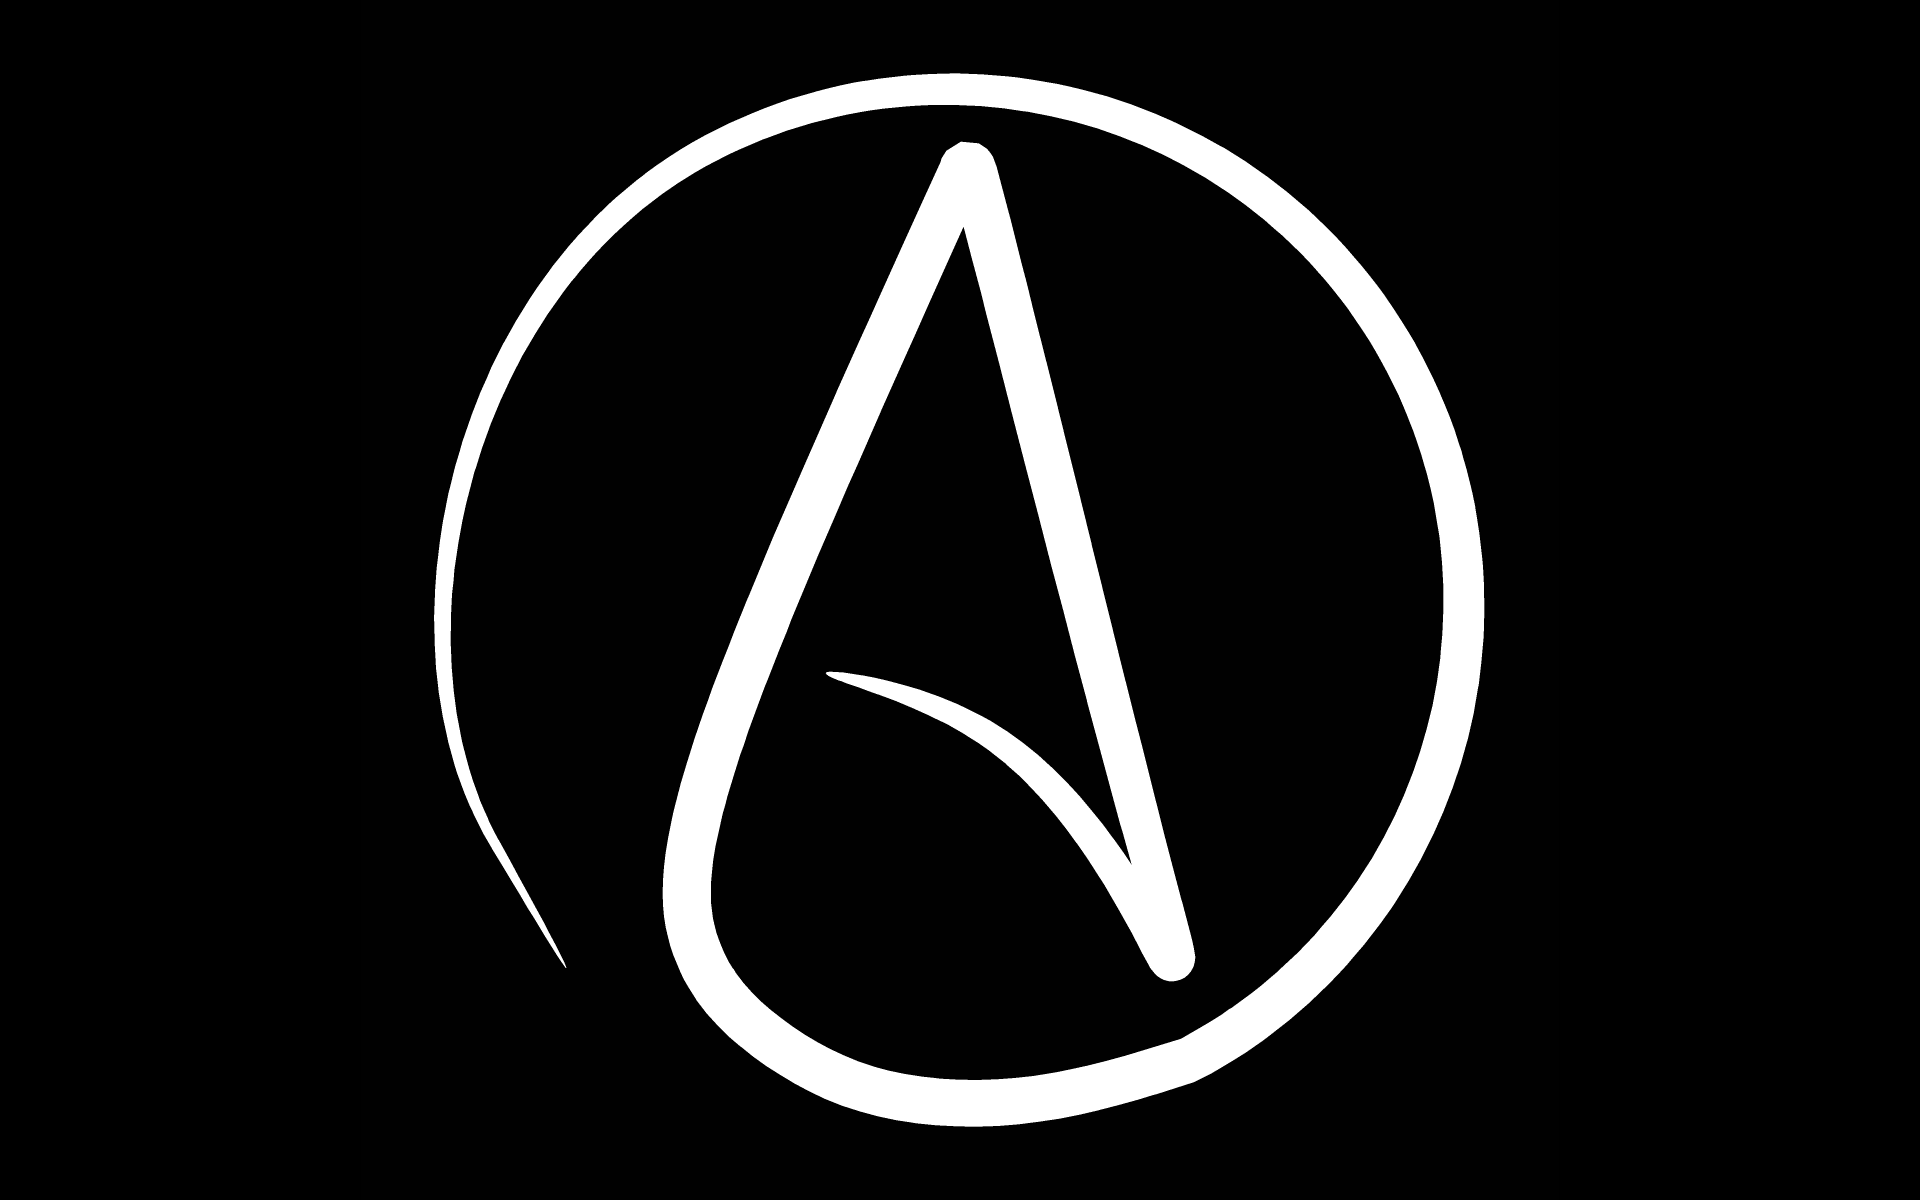 Free atheist symbol wallpapers wallpaper cave - Atheist desktop wallpaper ...